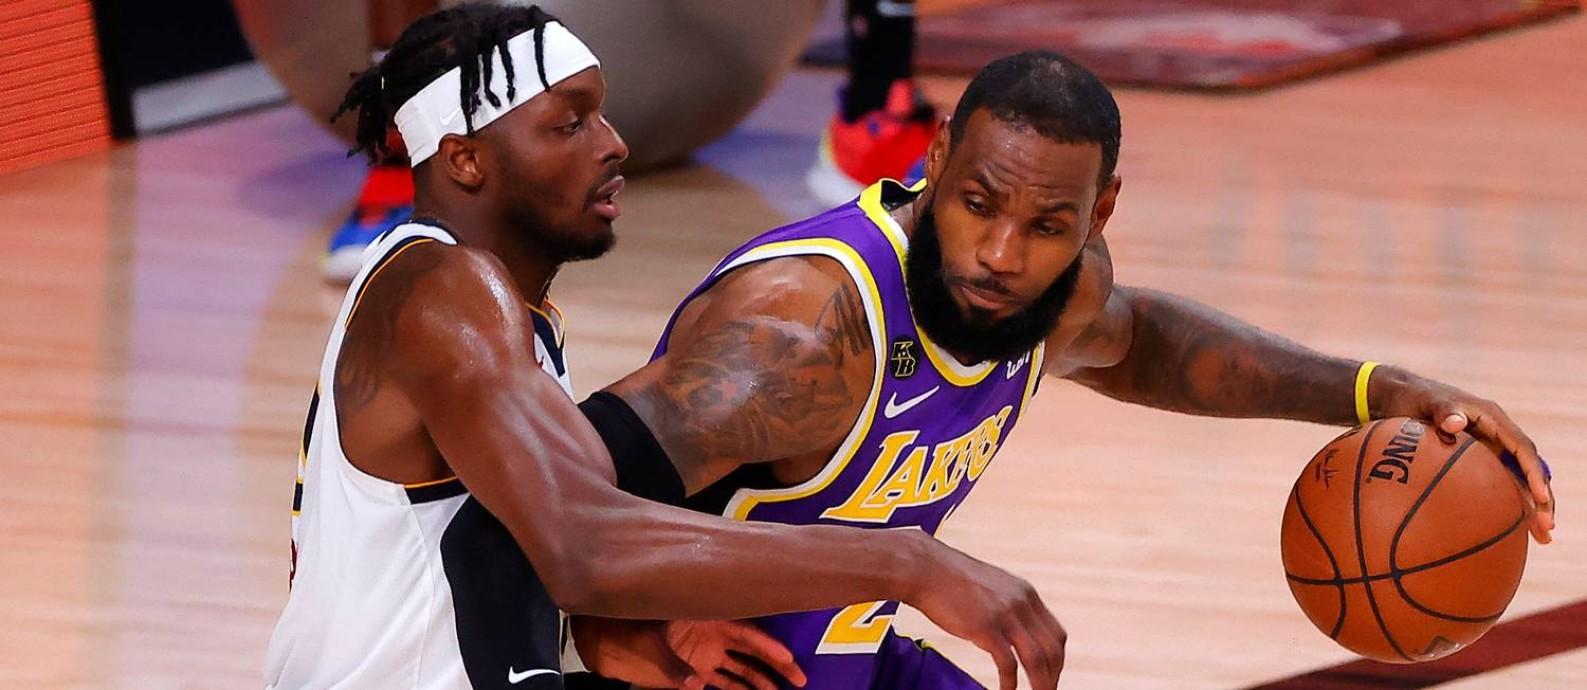 LeBron James, marcado por Jerami Grant, liderou o Los Angeles Lakers na classificação sobre o Denver Nuggets Foto: KEVIN C. COX / AFP